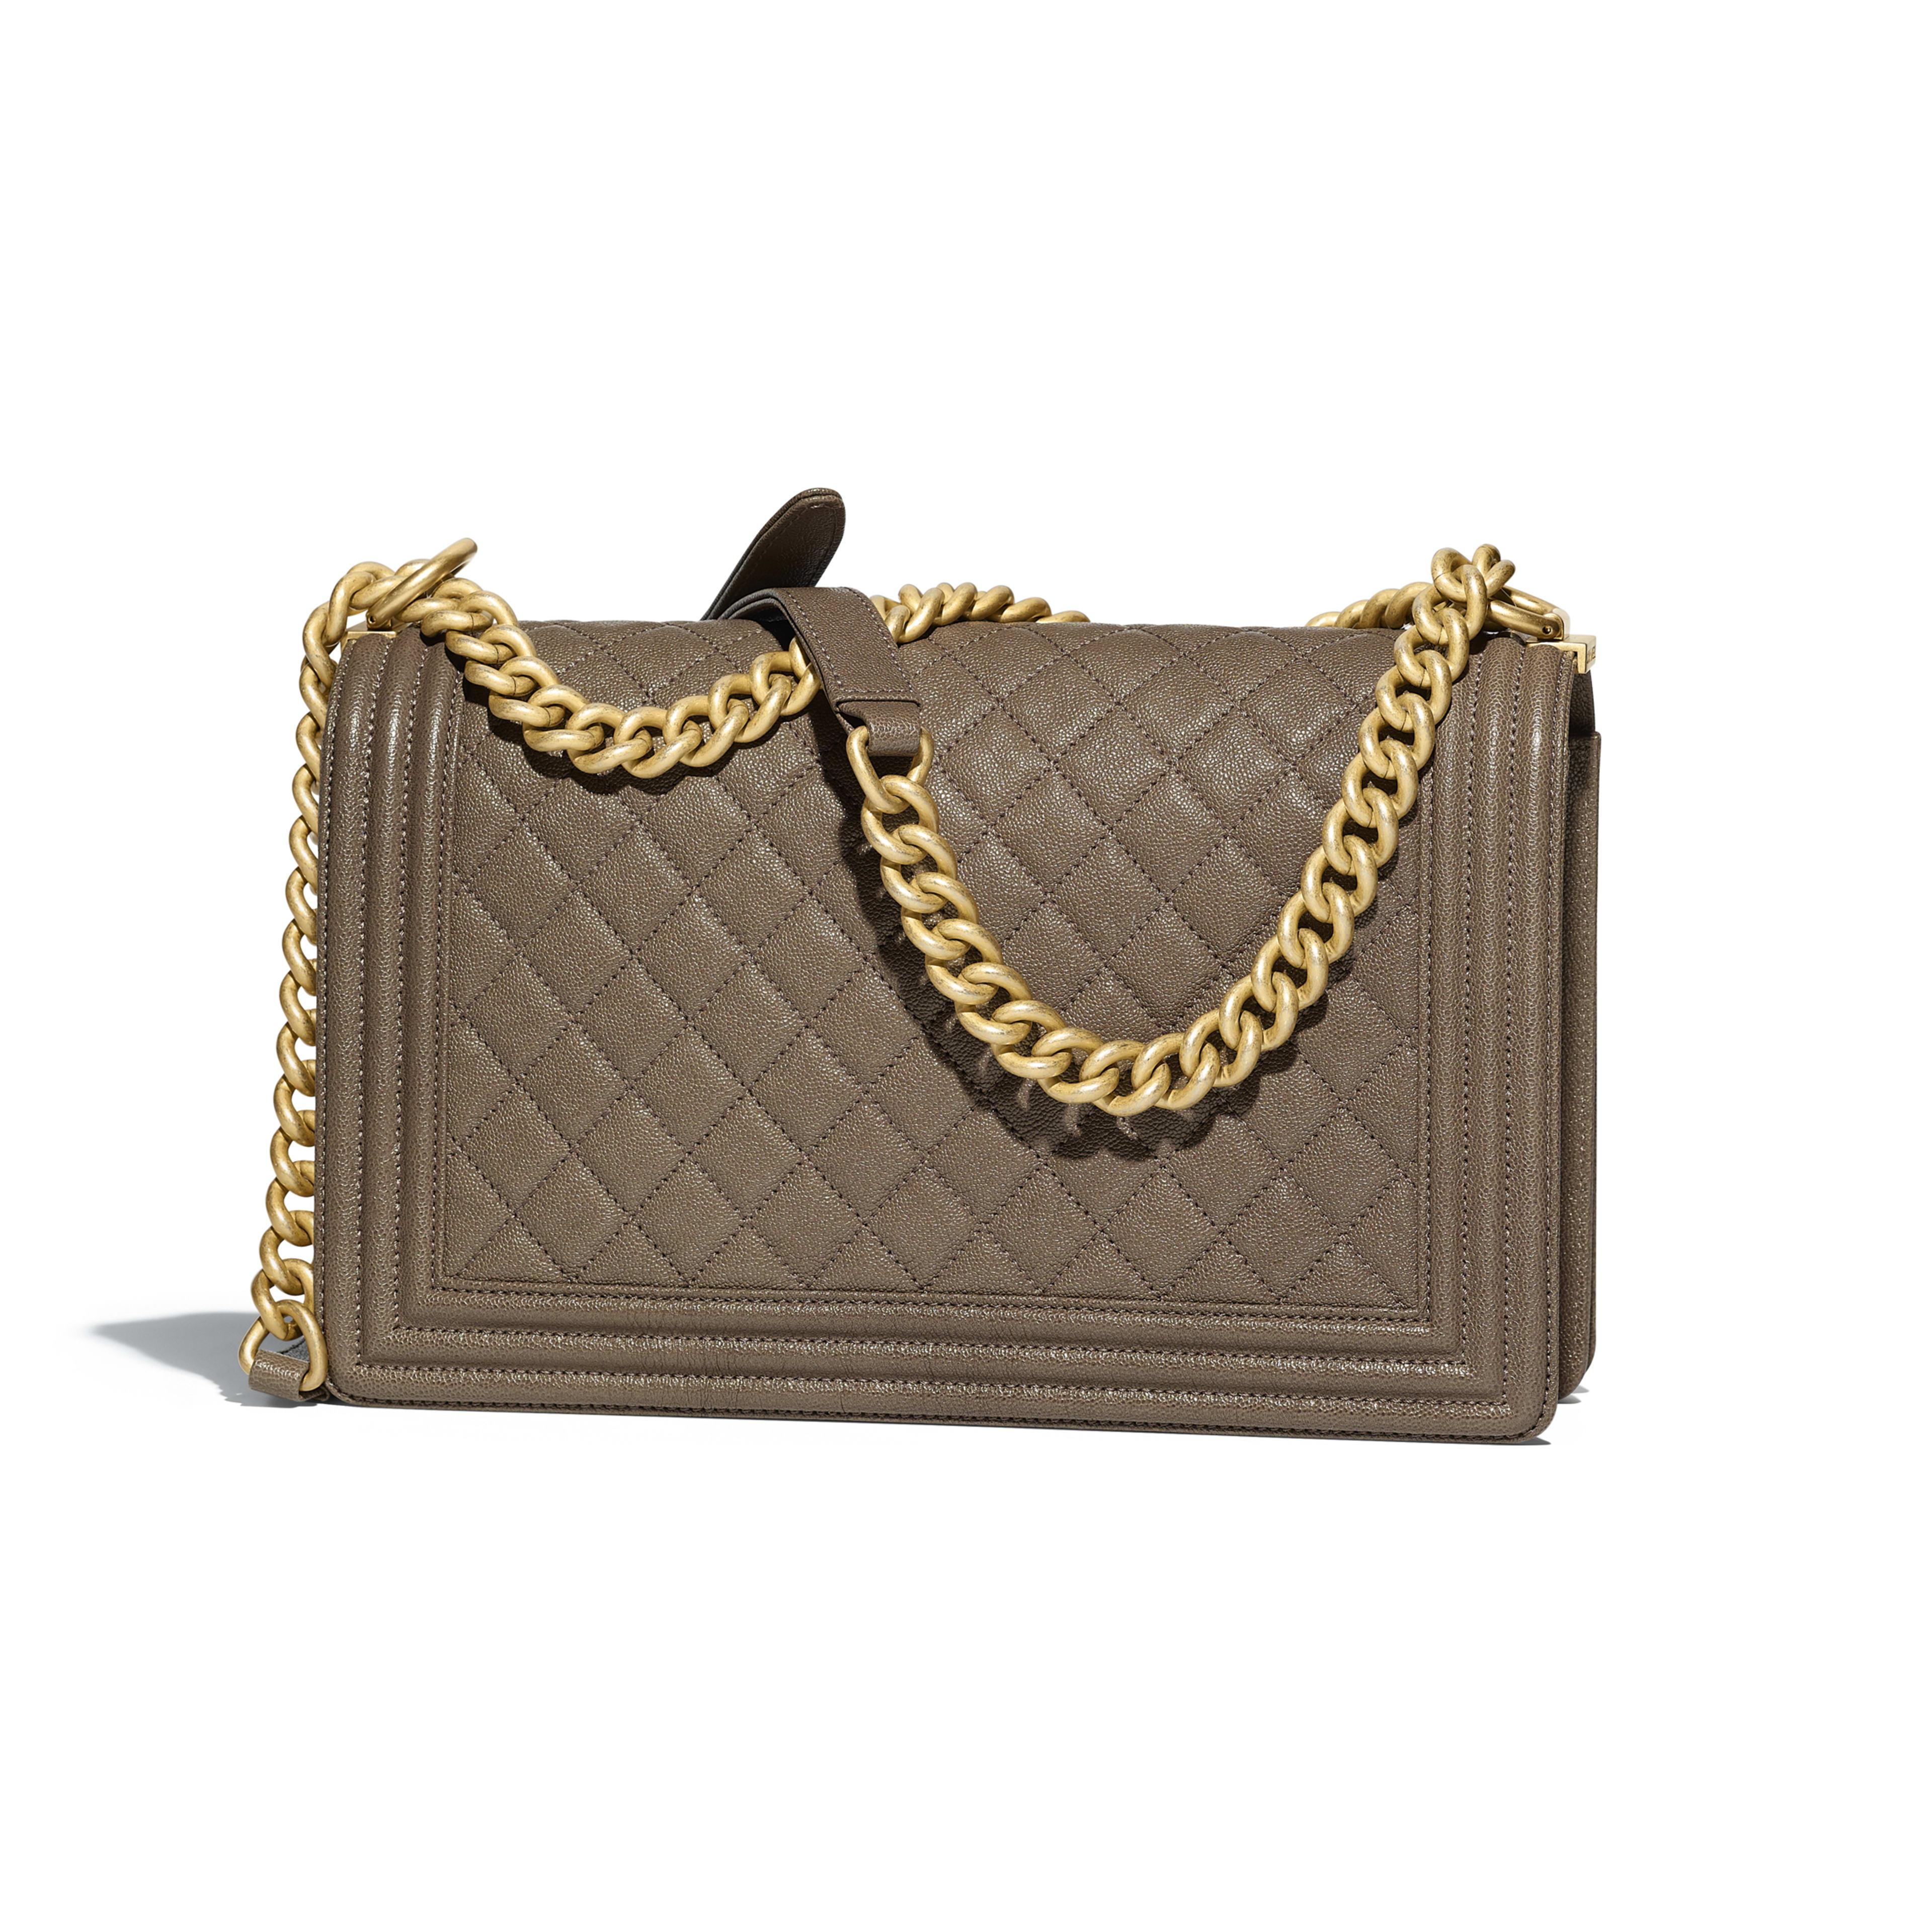 Large BOY CHANEL Handbag Grained Calfskin & Gold-Tone Metal Khaki -                                       view 2 - see full sized version